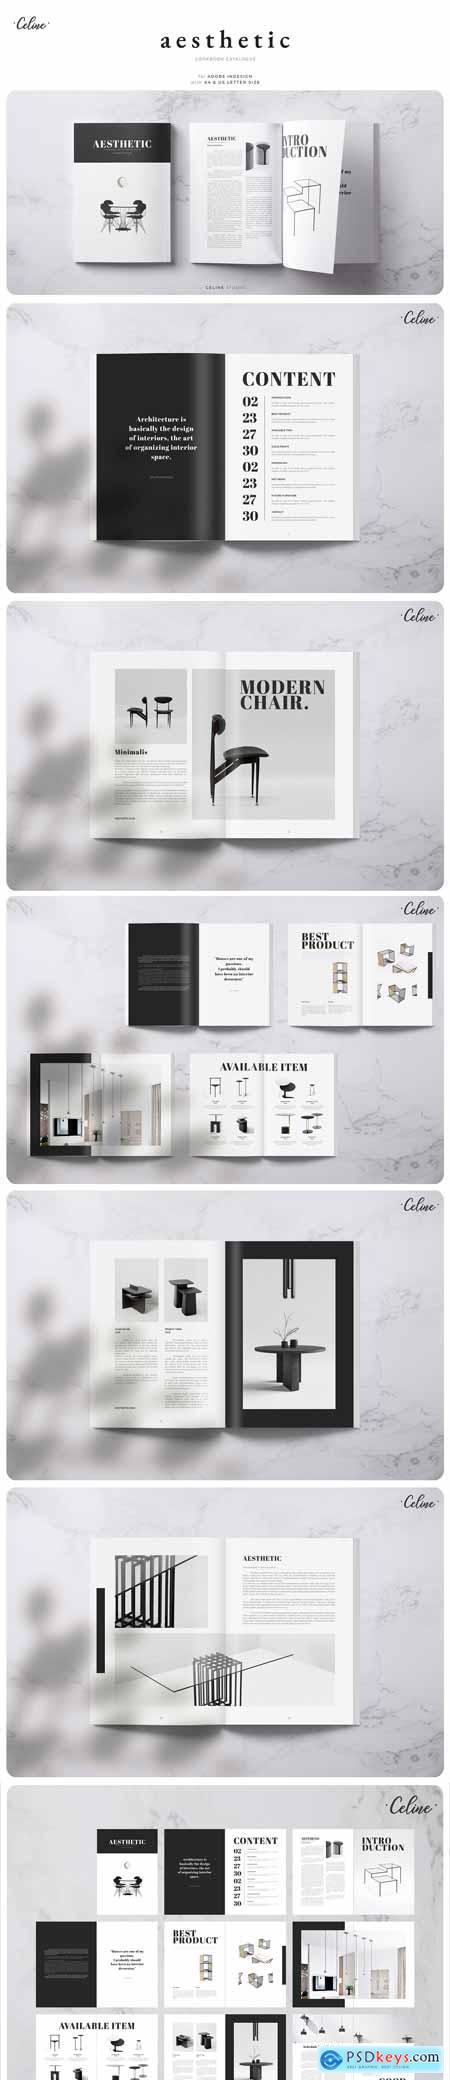 CreativeMarket Aesthetic Lookbook Catalogue